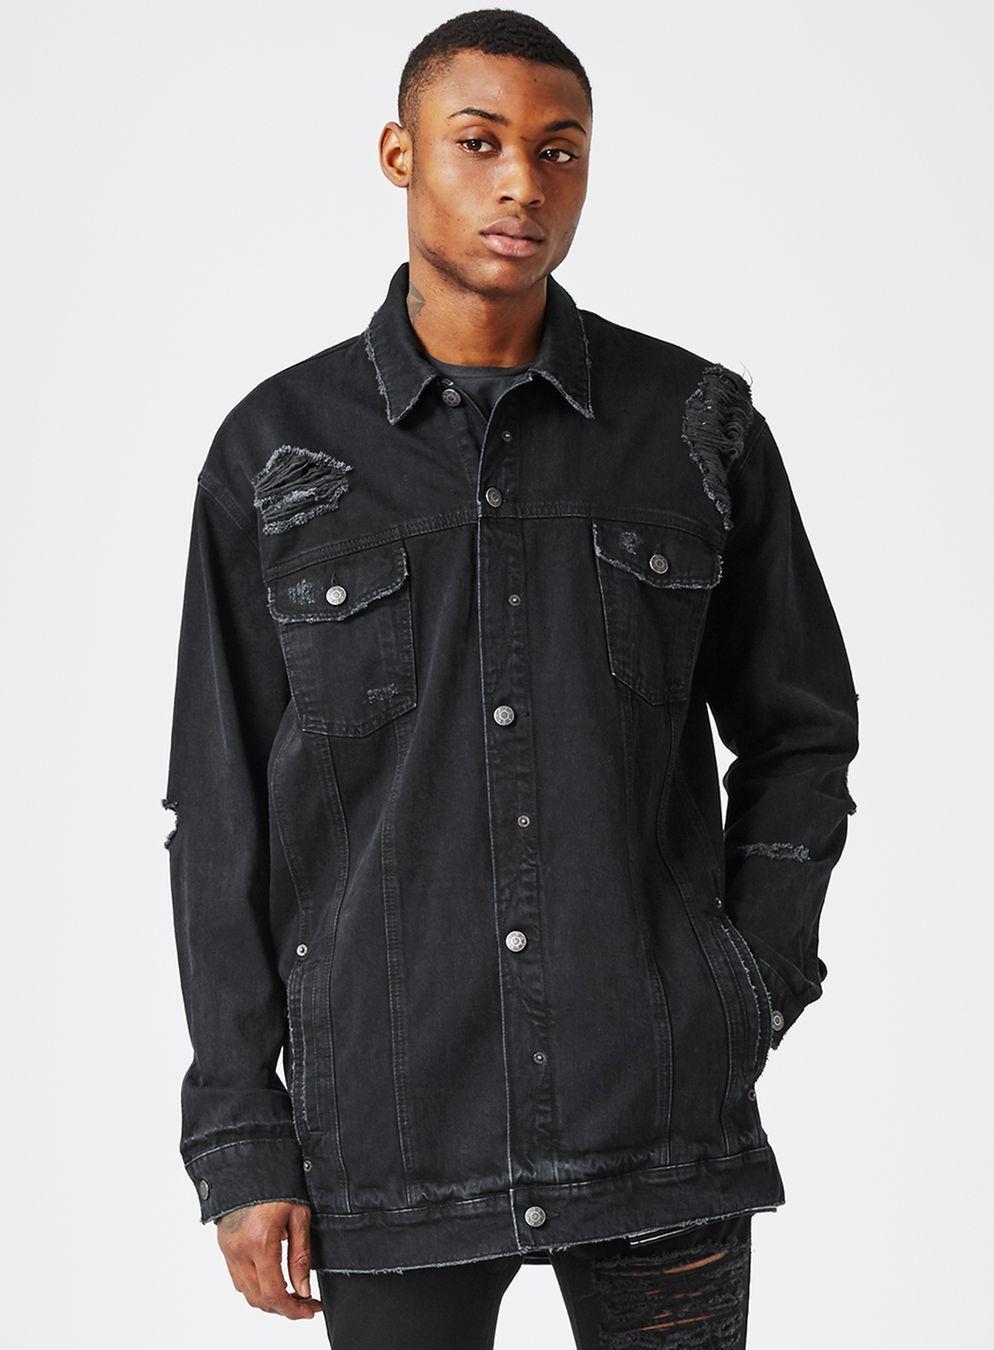 Aaa Black Distressed Longline Denim Jacket Men S Coats Jackets Clothing Topman Longline Denim Jacket Denim Jacket Men Mens Jackets [ 1350 x 994 Pixel ]